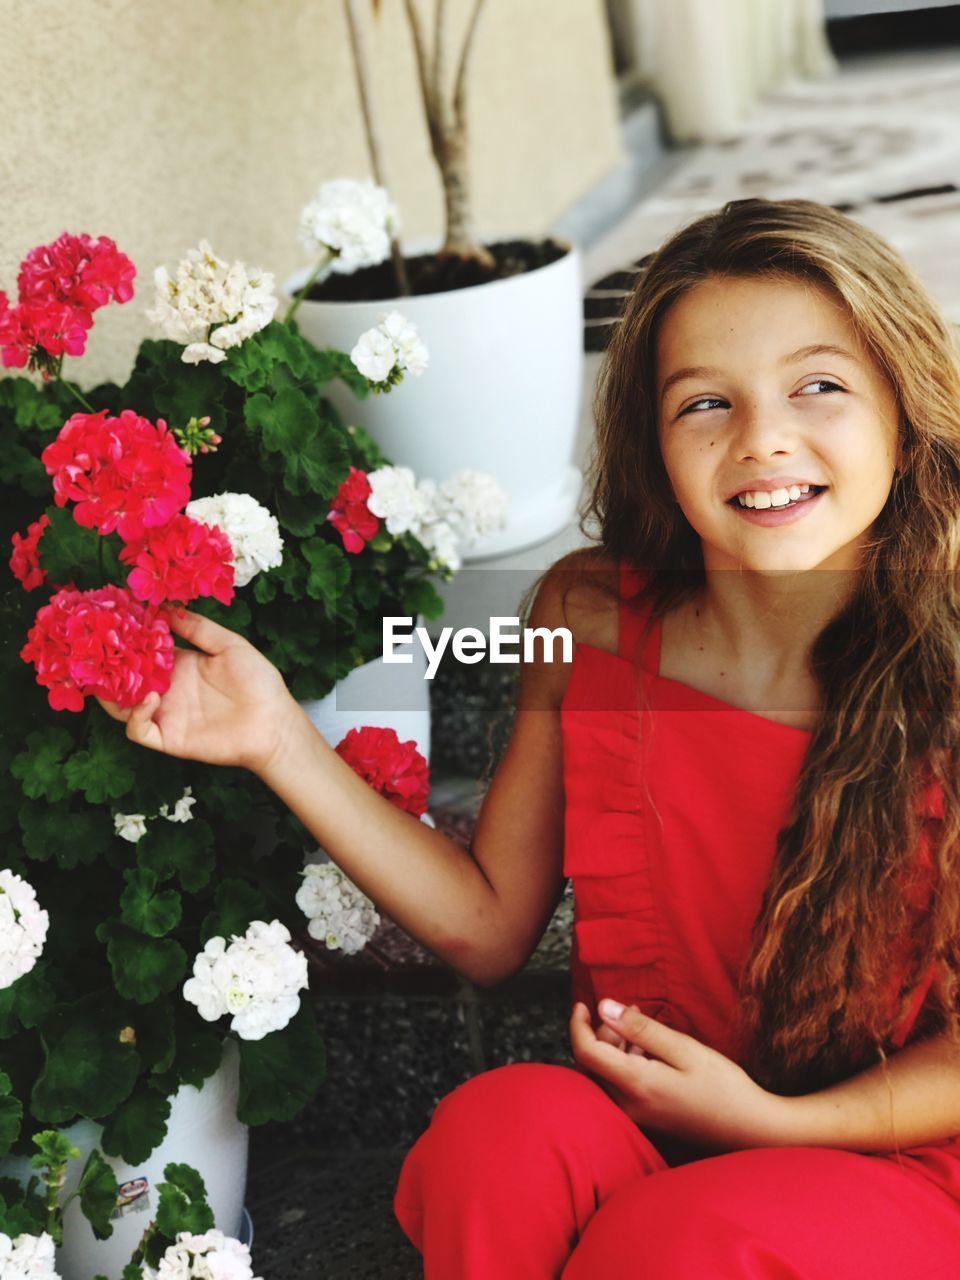 Teenage girl holding flowers while looking away